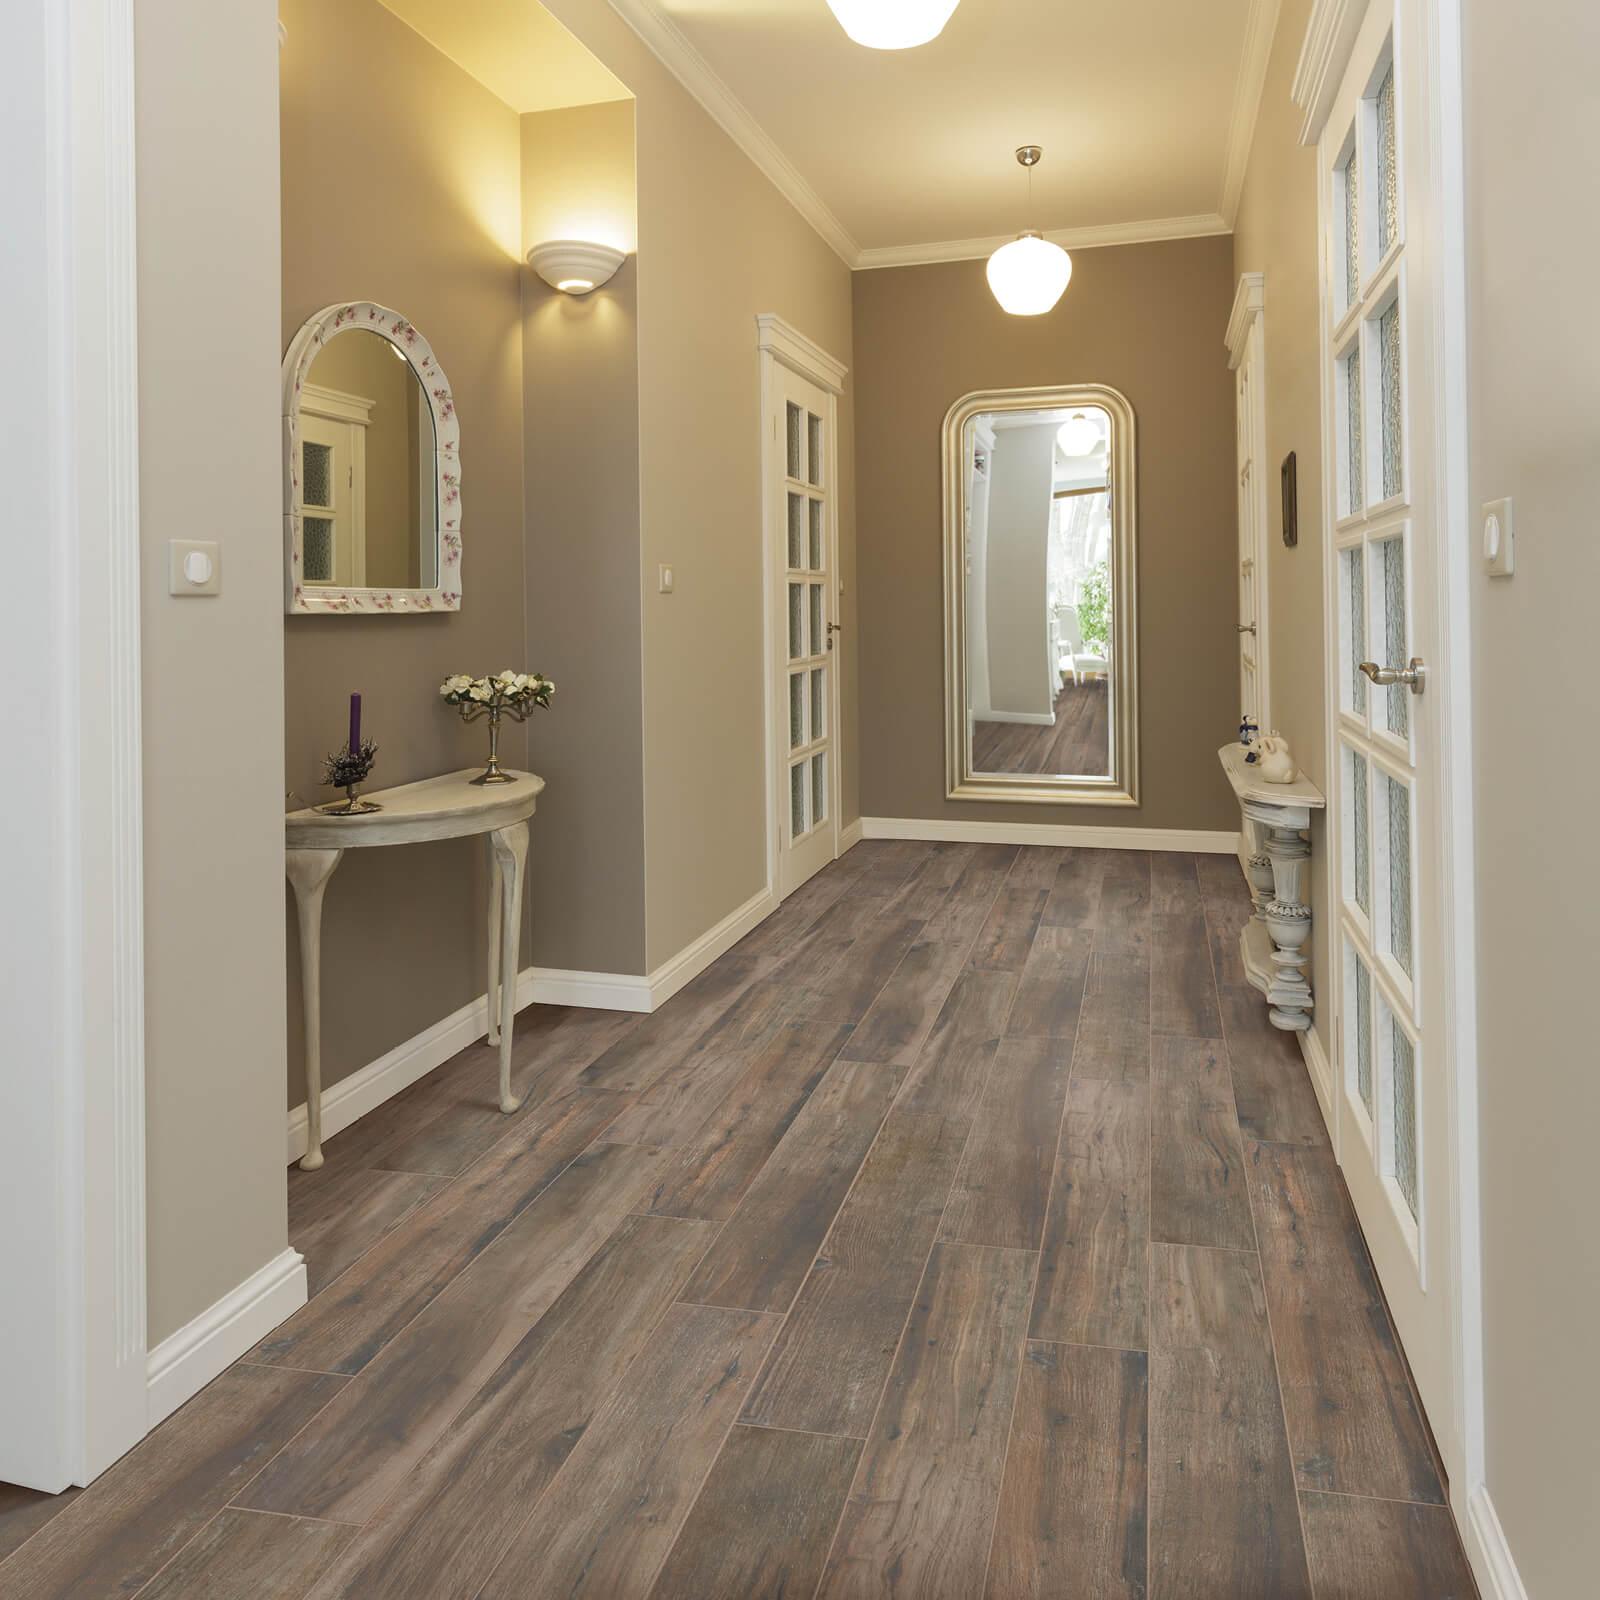 Magnolia bend ozark brown Flooring | Wacky's Flooring